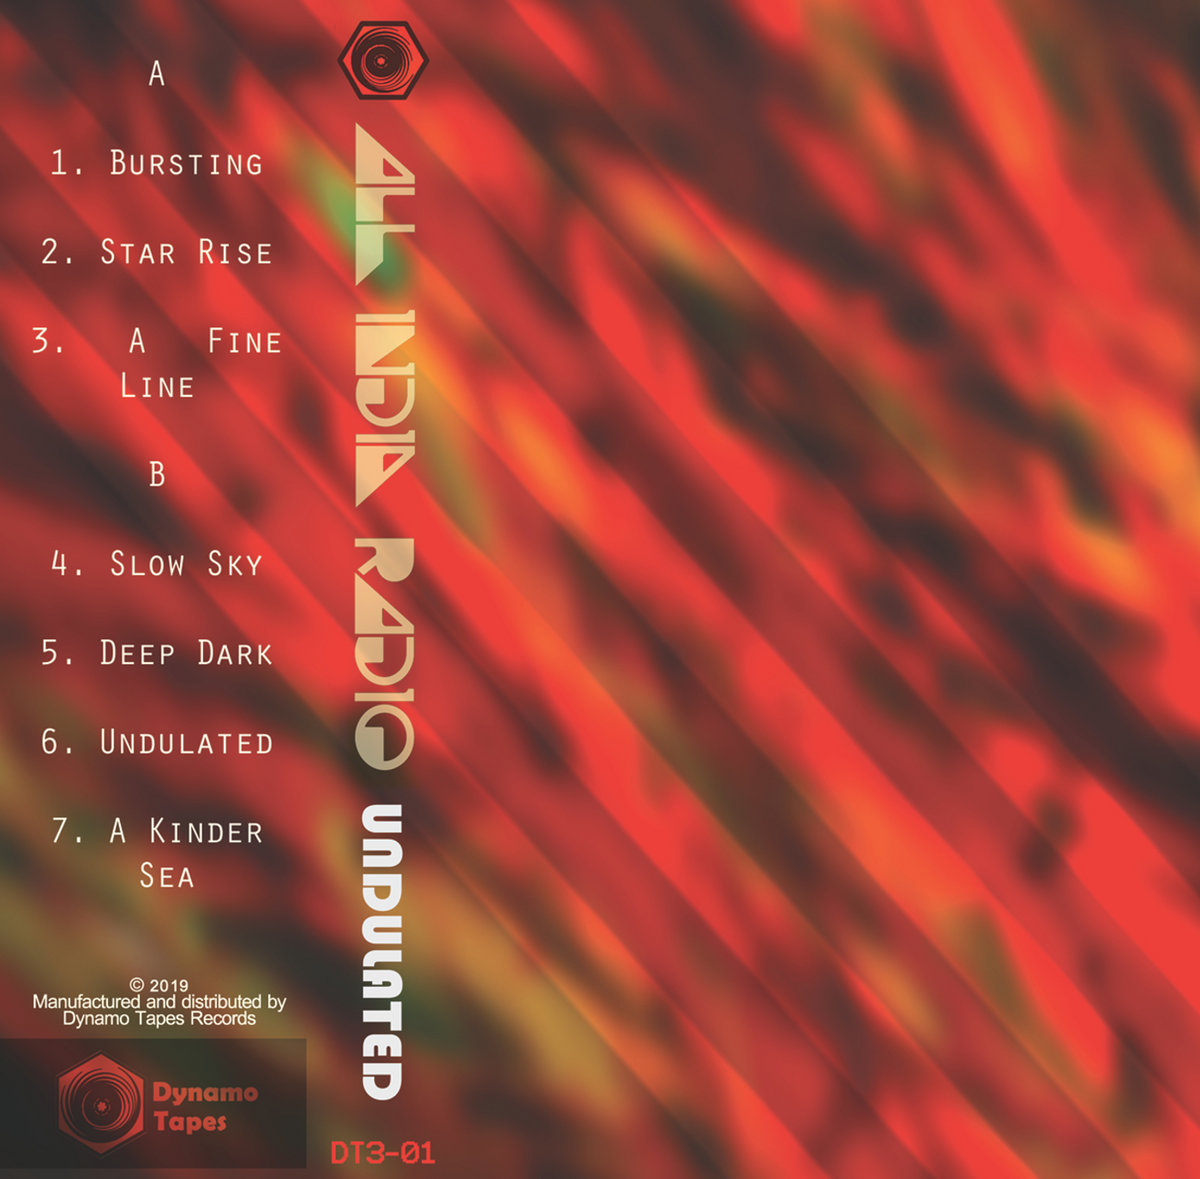 All India Radio - Undulated | Dynamo Tapes